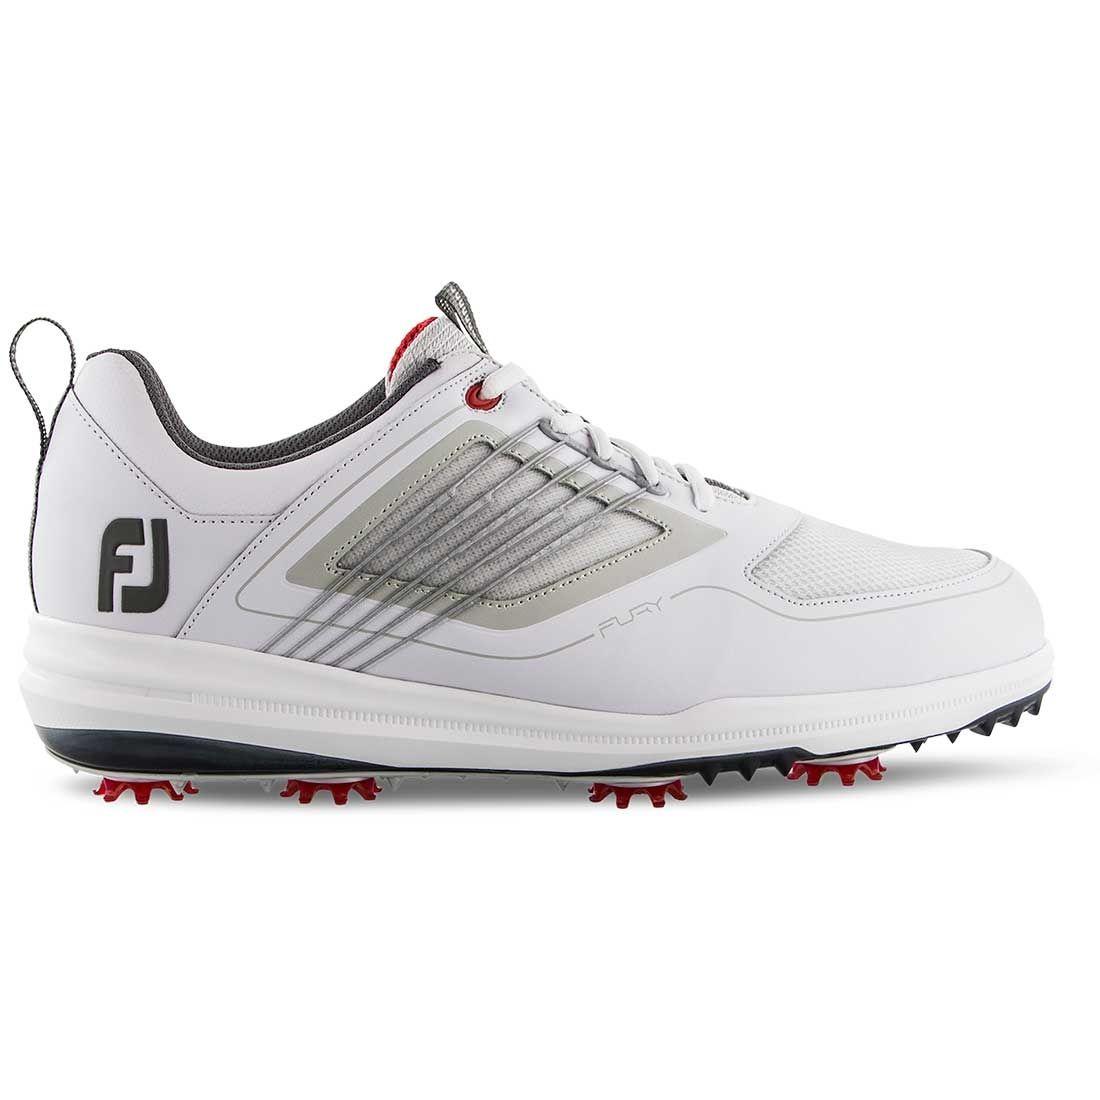 FootJoy FJ Fury Golf Shoes White/Red